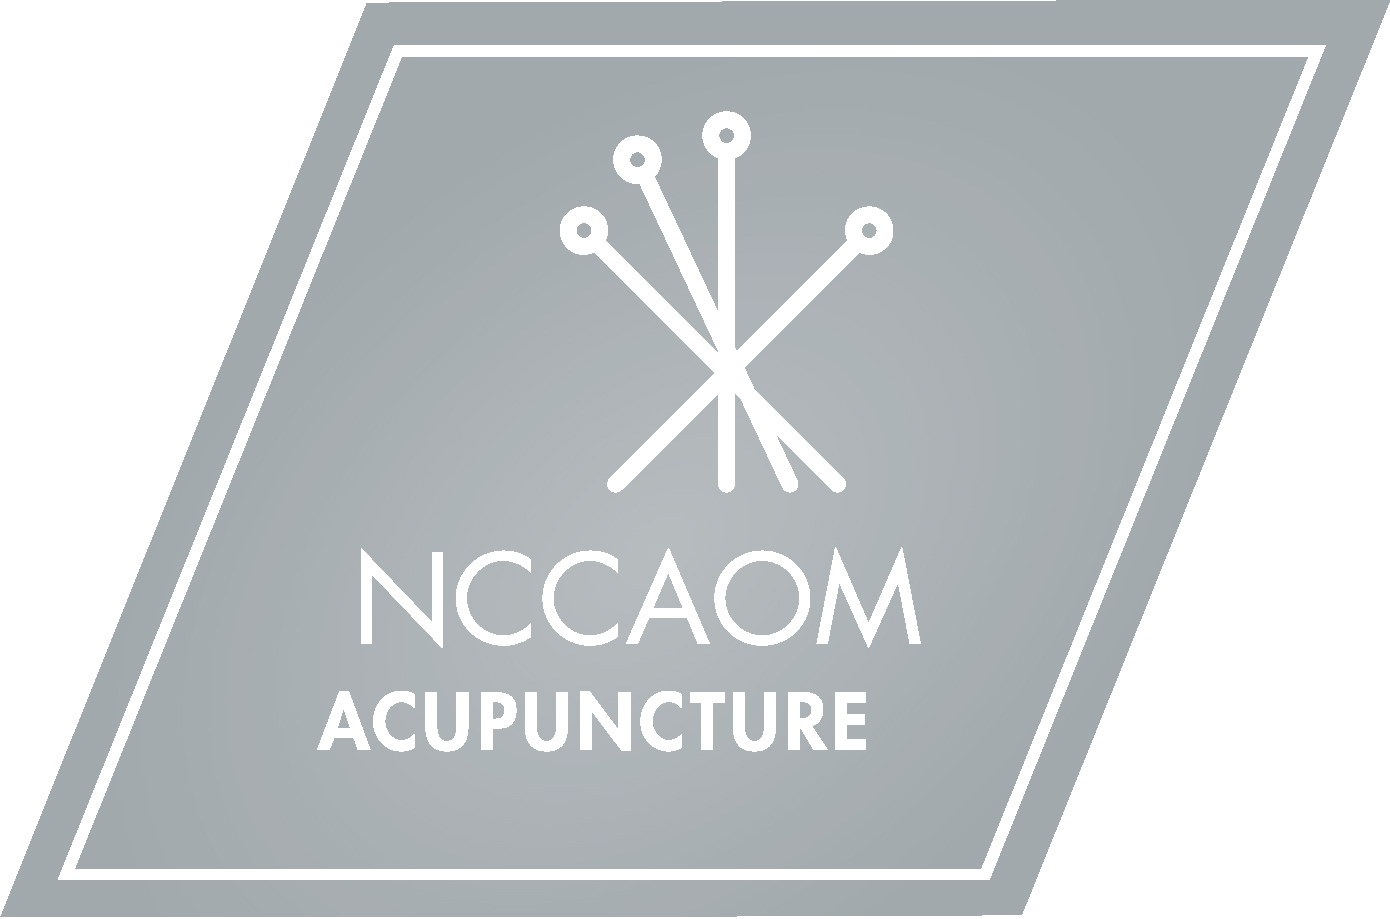 NCCAOM Digital Badge AC